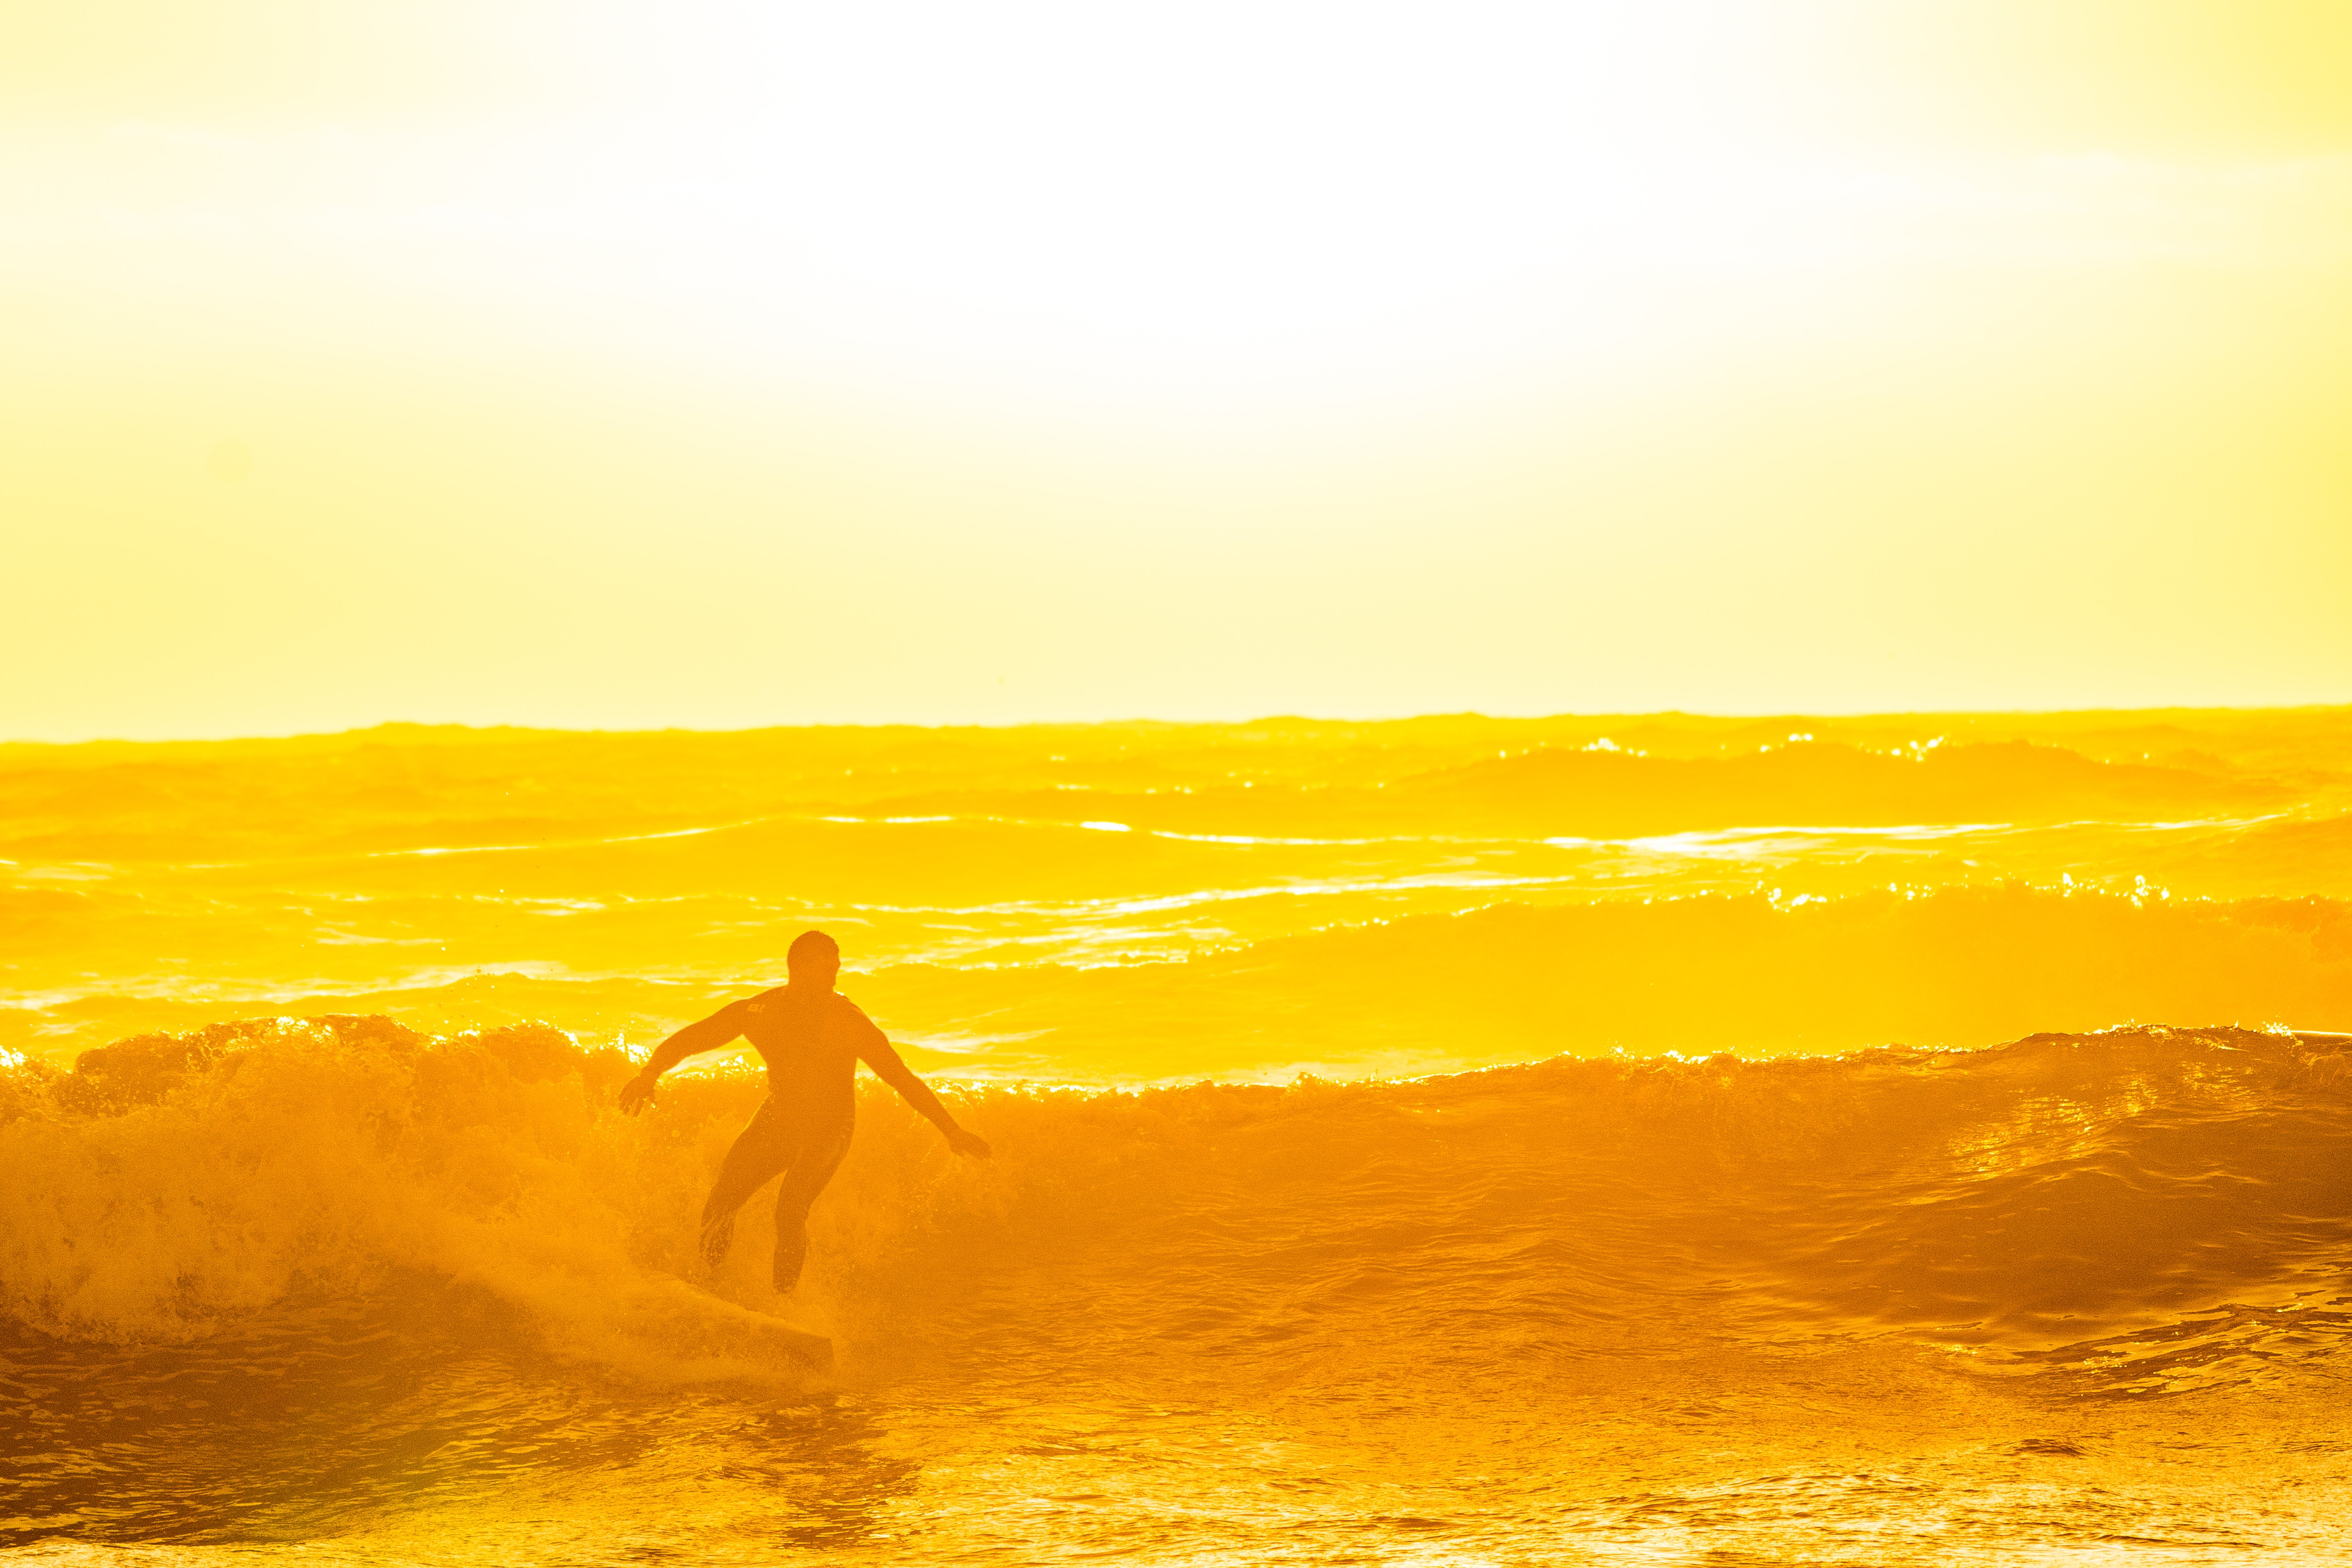 dawn-golden-hour-ocean-1654495